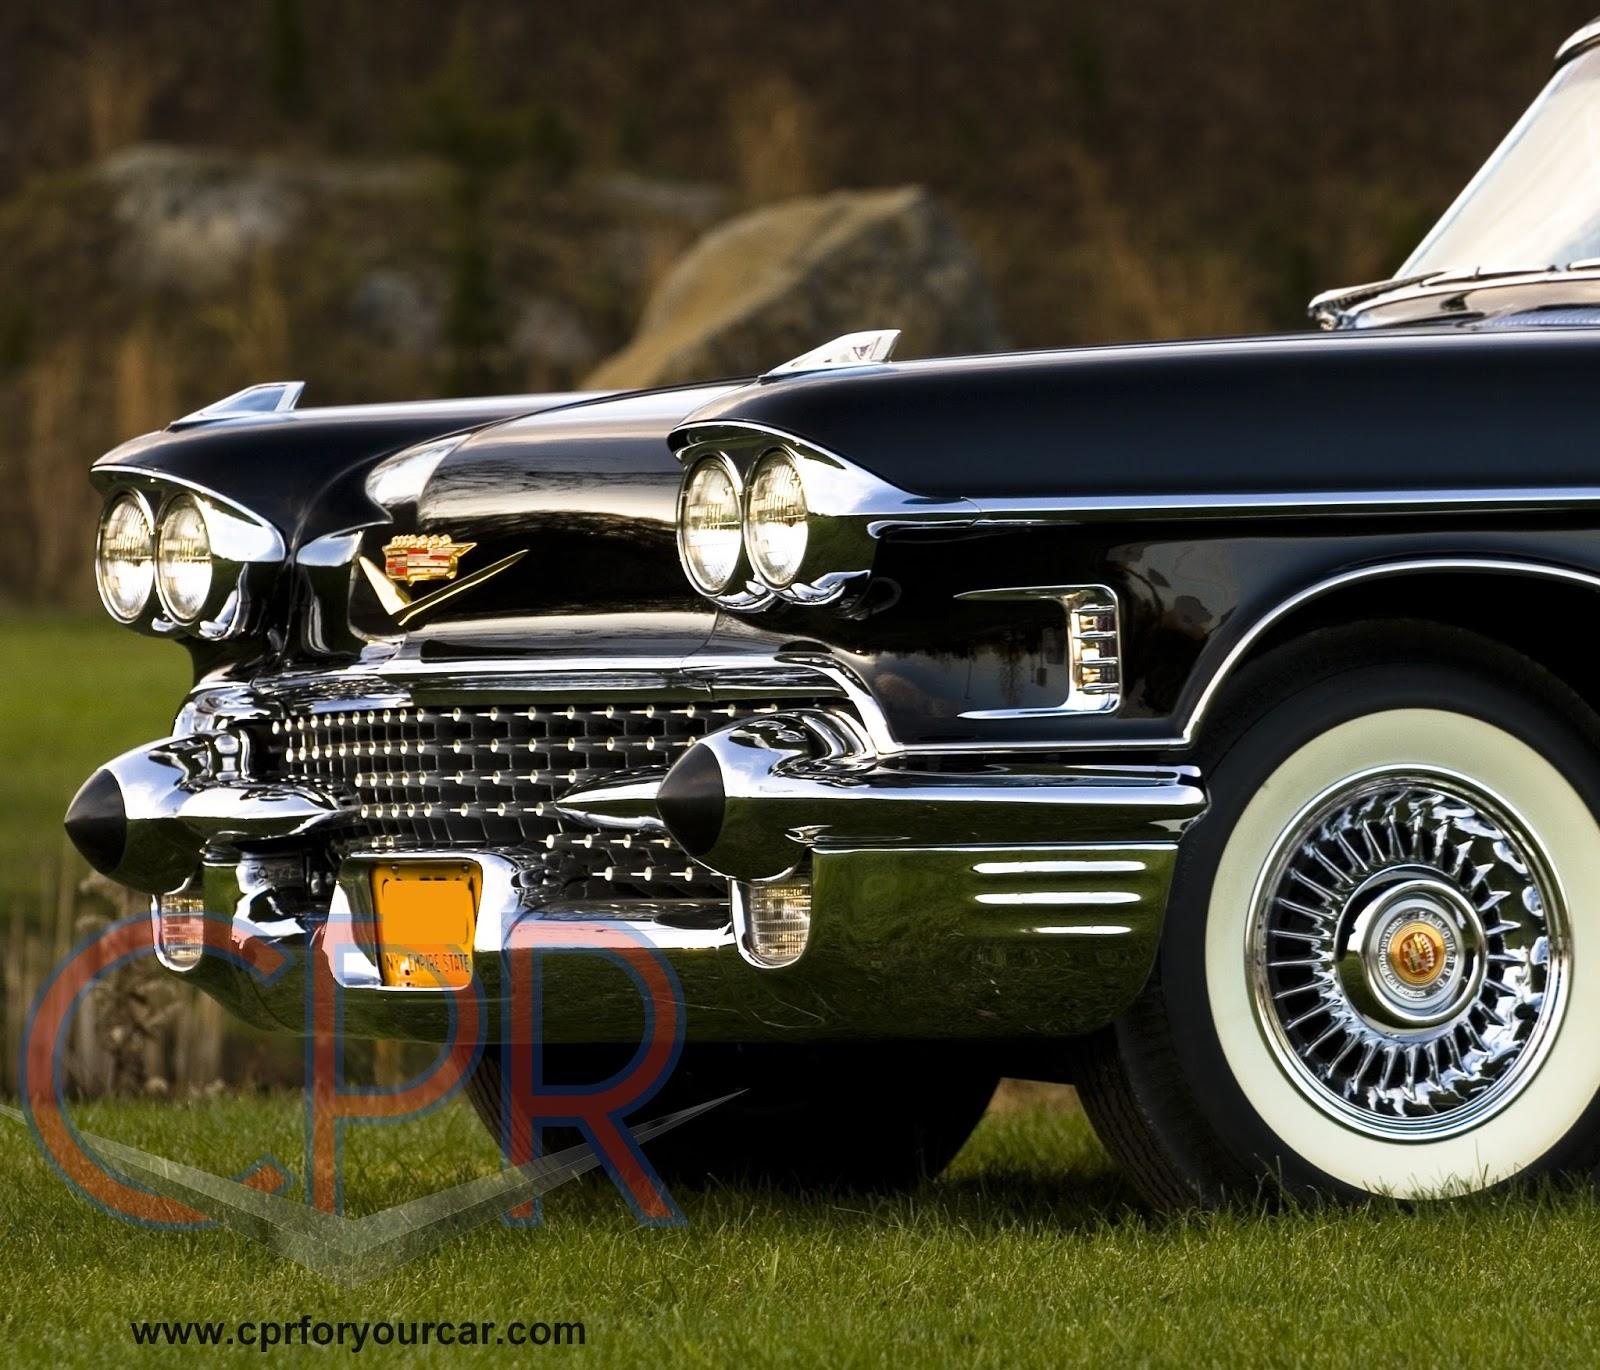 Cadillac Parts & Restoration: 2015